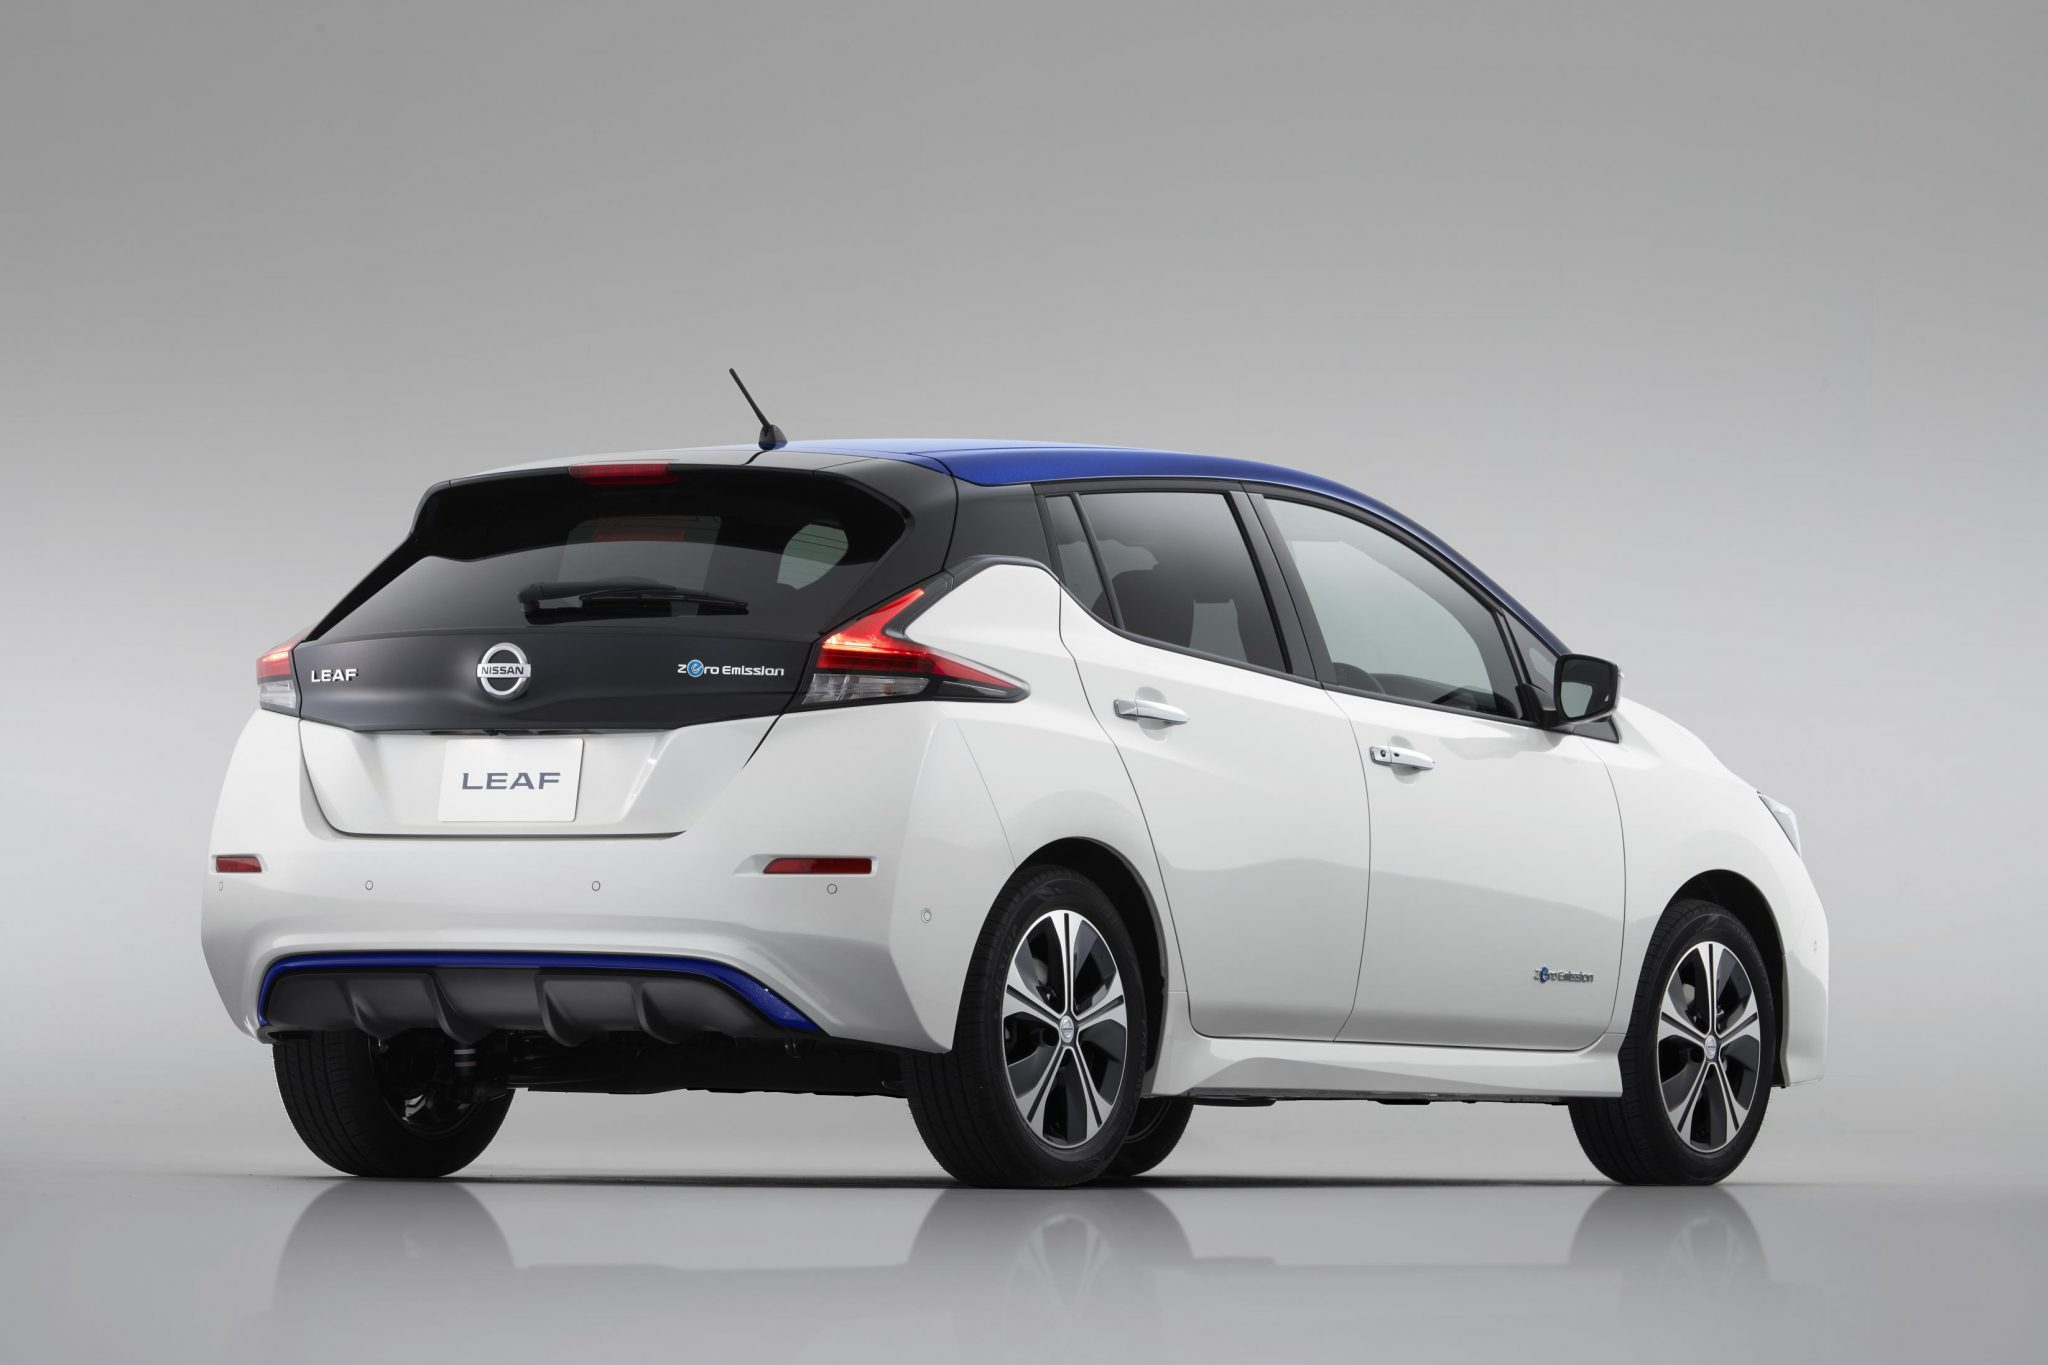 2018 Nissan Leaf Brings Greater Range And Semi Autonomous Drive